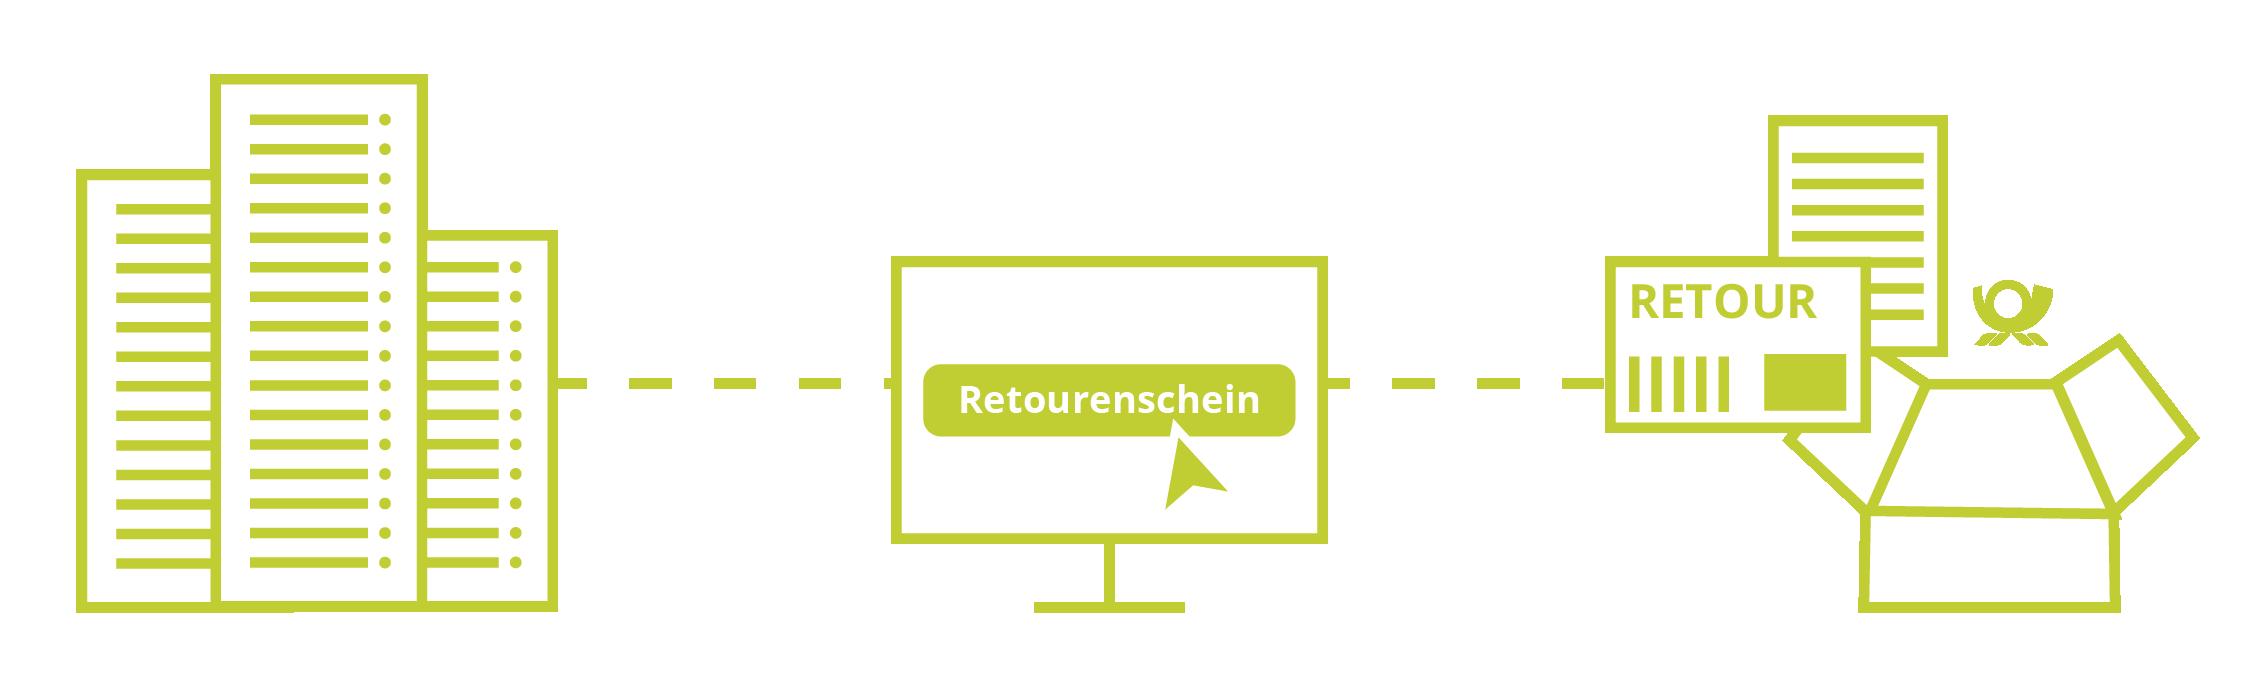 Blogbeiträge-Grafiken-Retourenmanagement_faveo-1